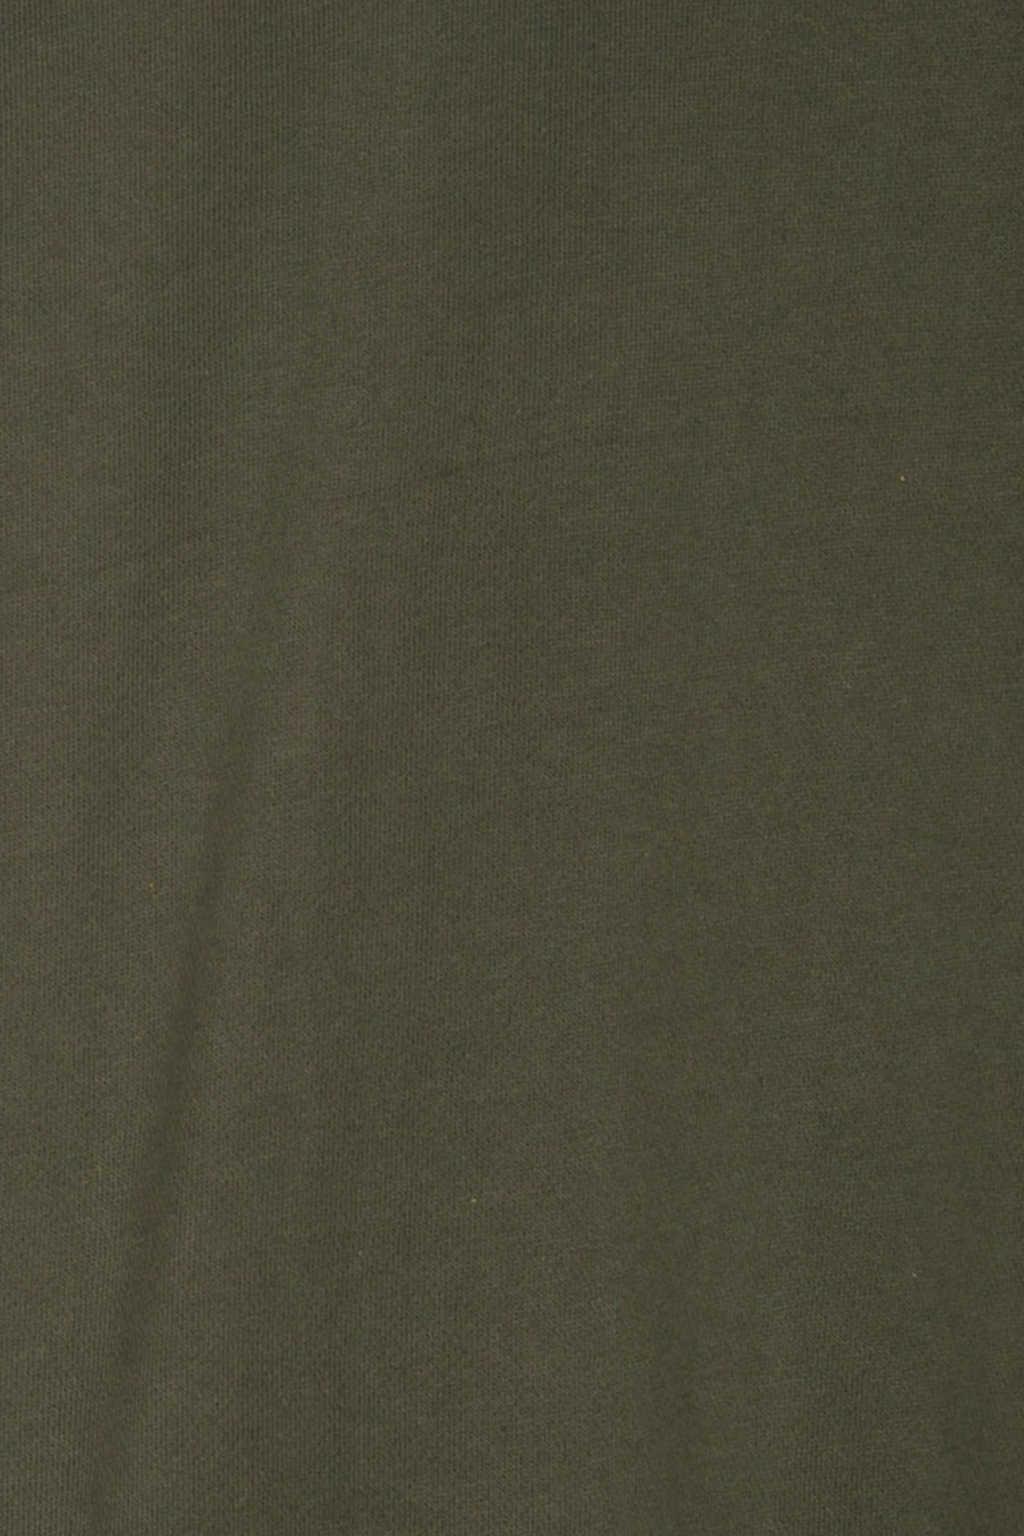 Sweater H054 Olive 10